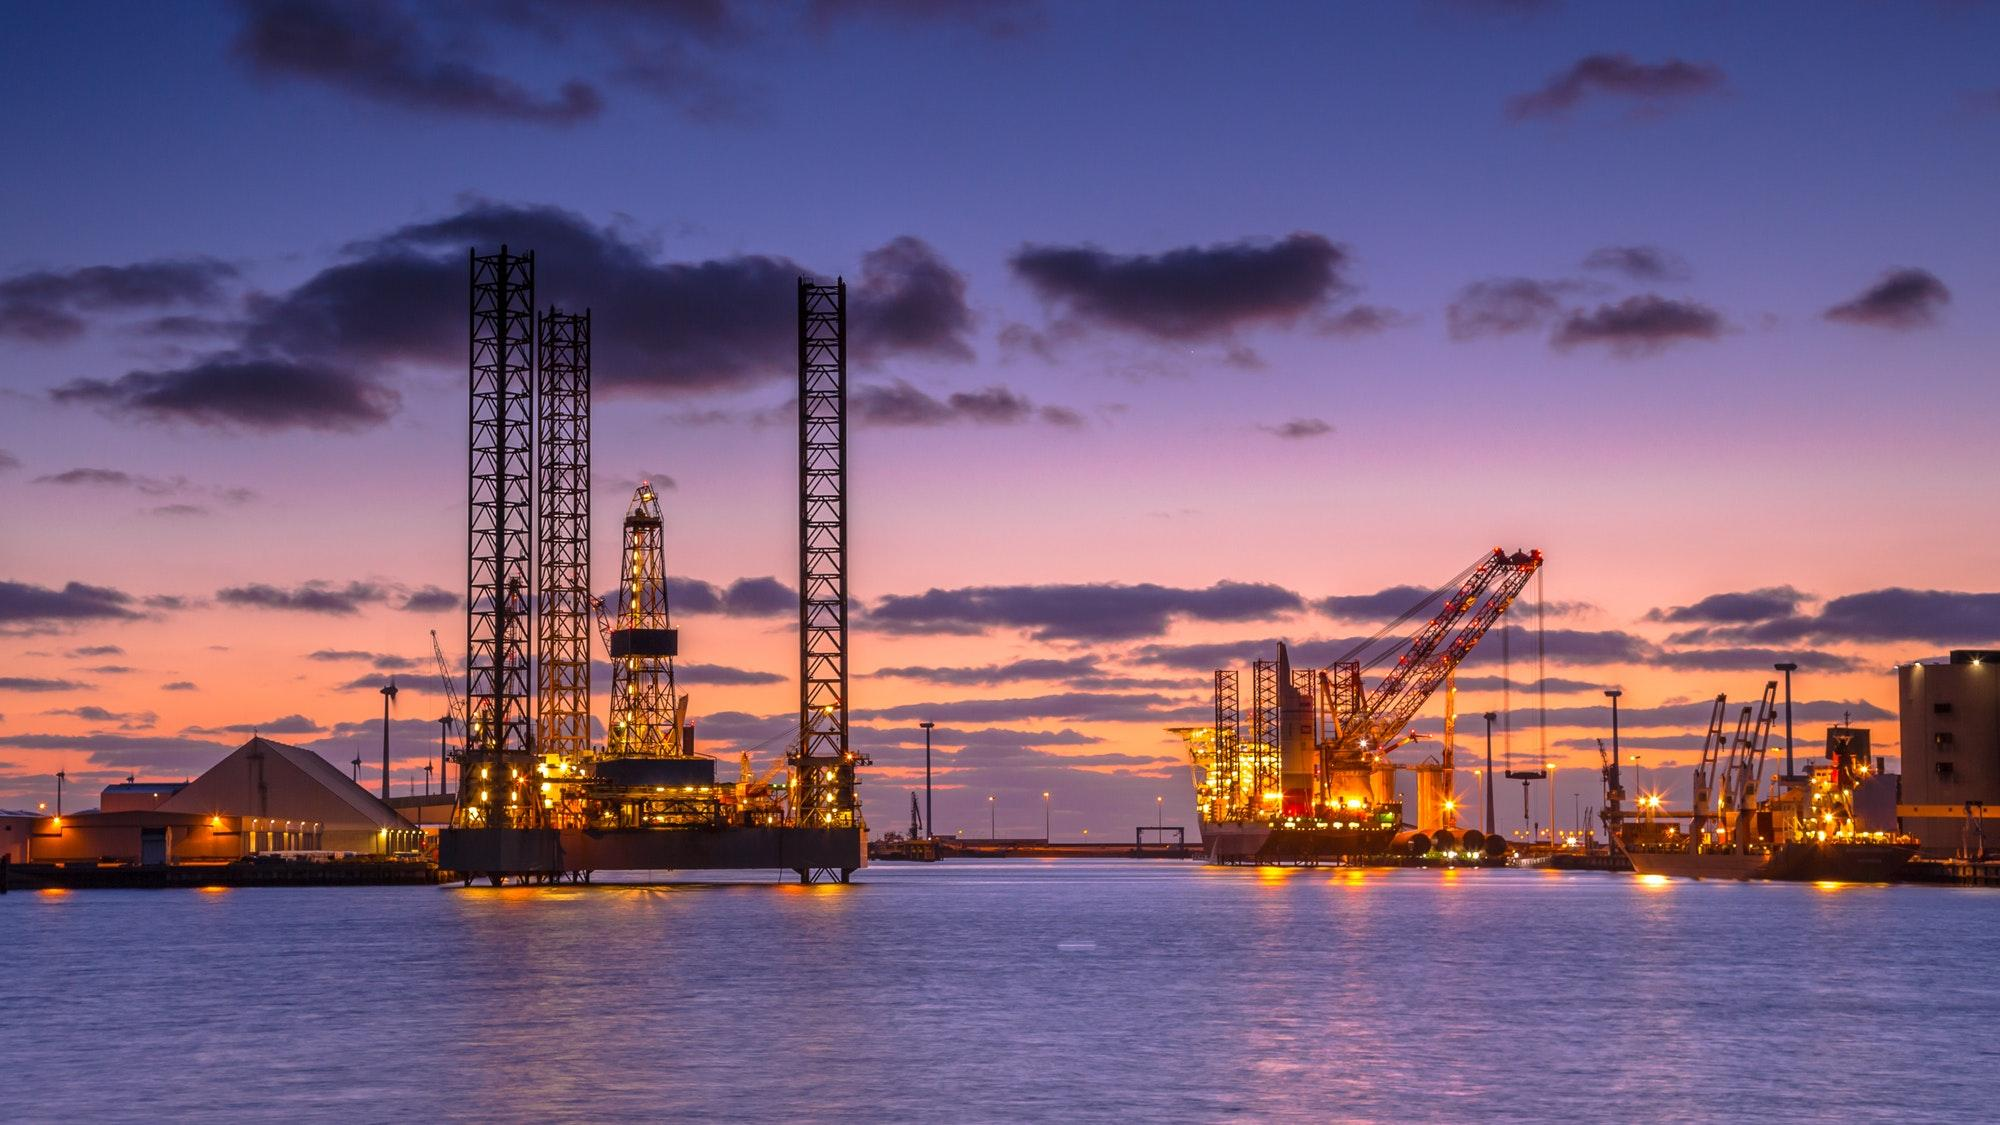 uploads///oil drilling rig construction site